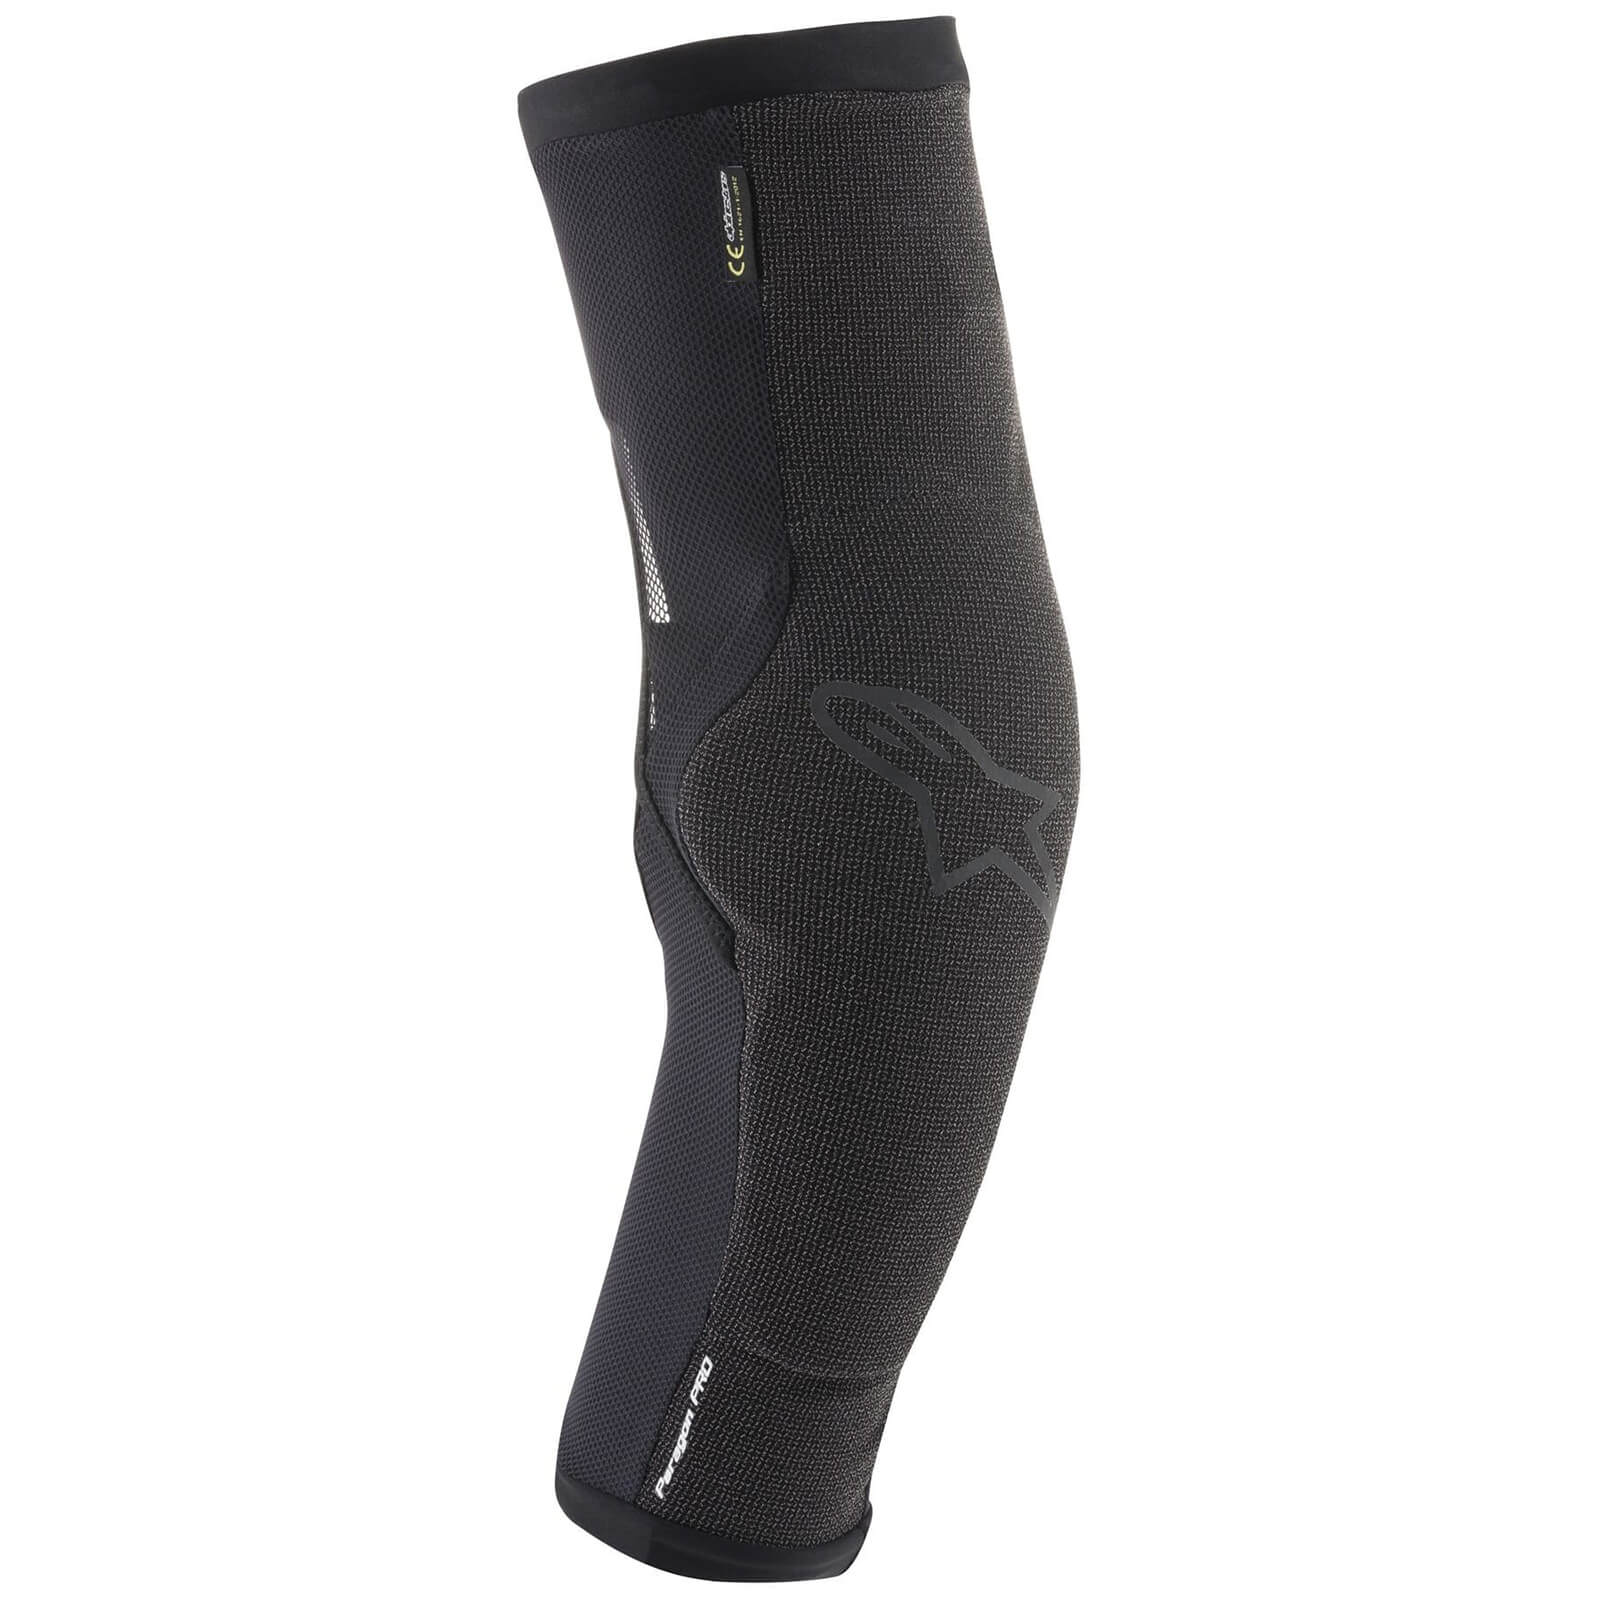 Alpinestars Paragon Pro MTB Knee Protector - XXL